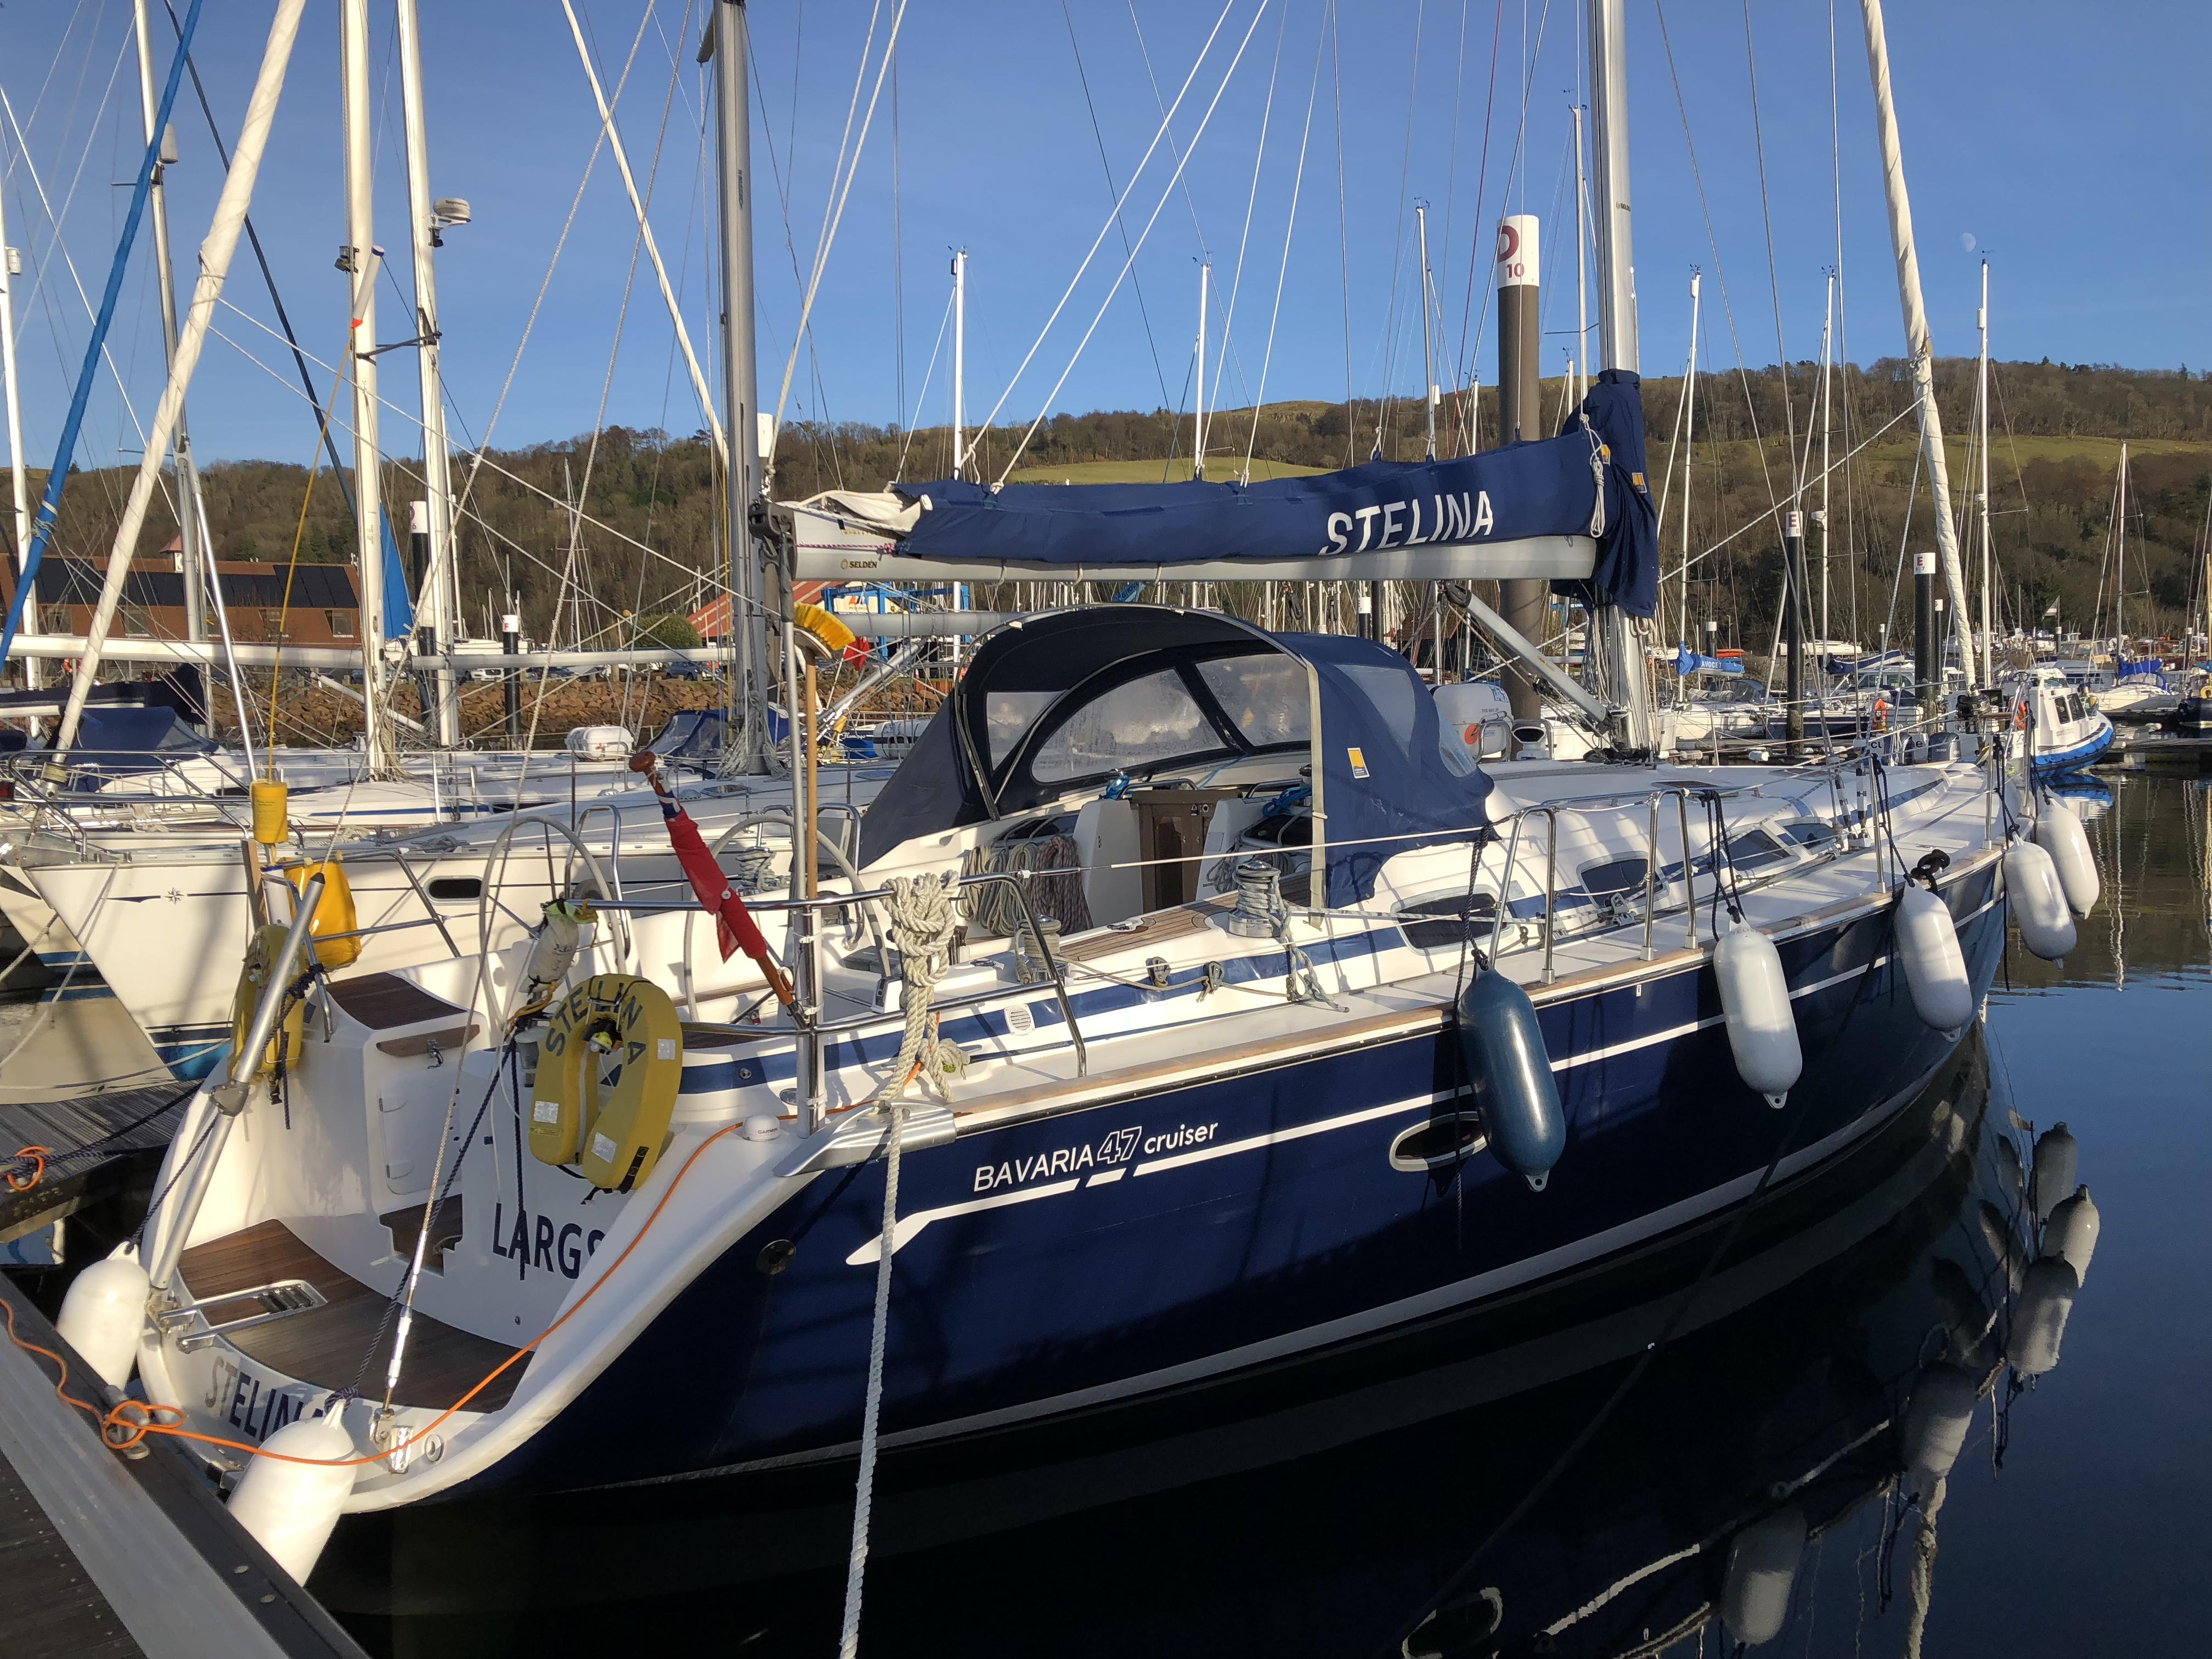 rya sailing power boat school courses scotland